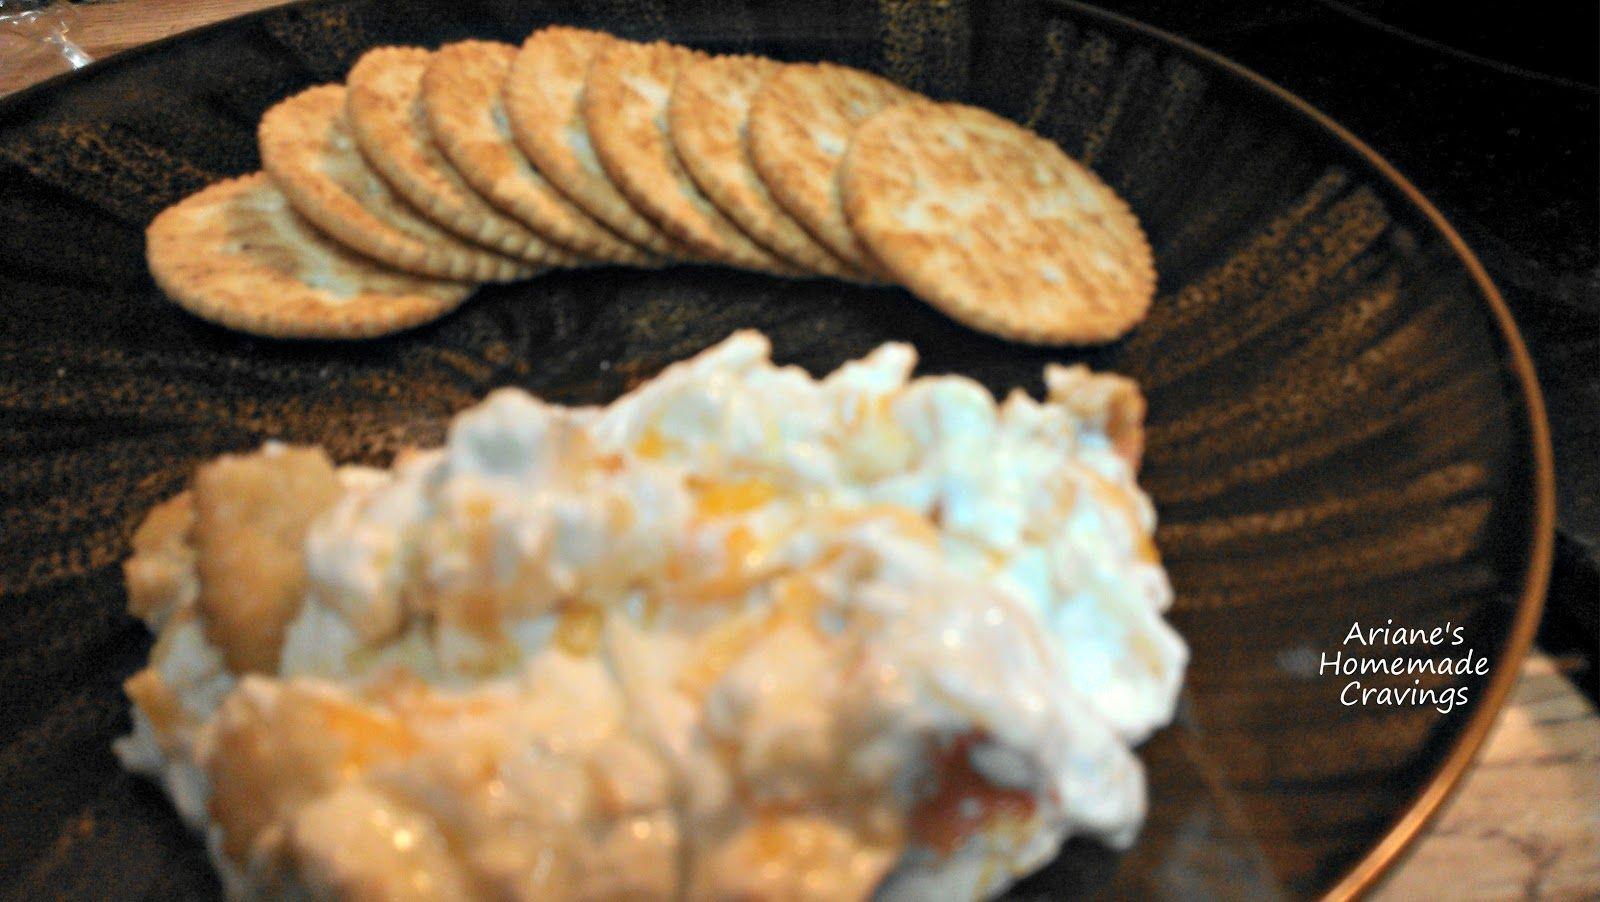 Ariane's Homemade Cravings: Cheesy Jalapeno Popper Dip